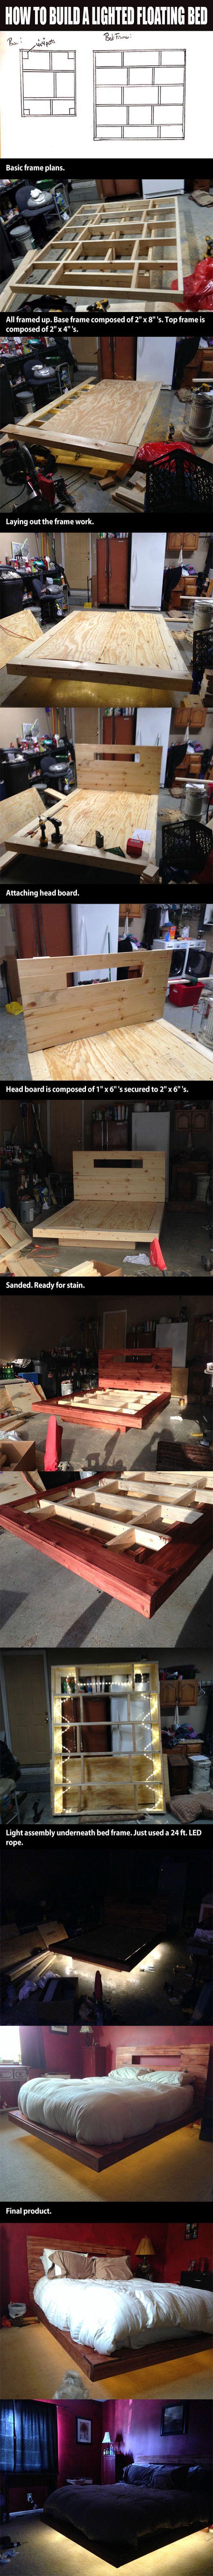 how to build a lighted floating bed 14 pics - Diy Kingsizekopfteil Plne